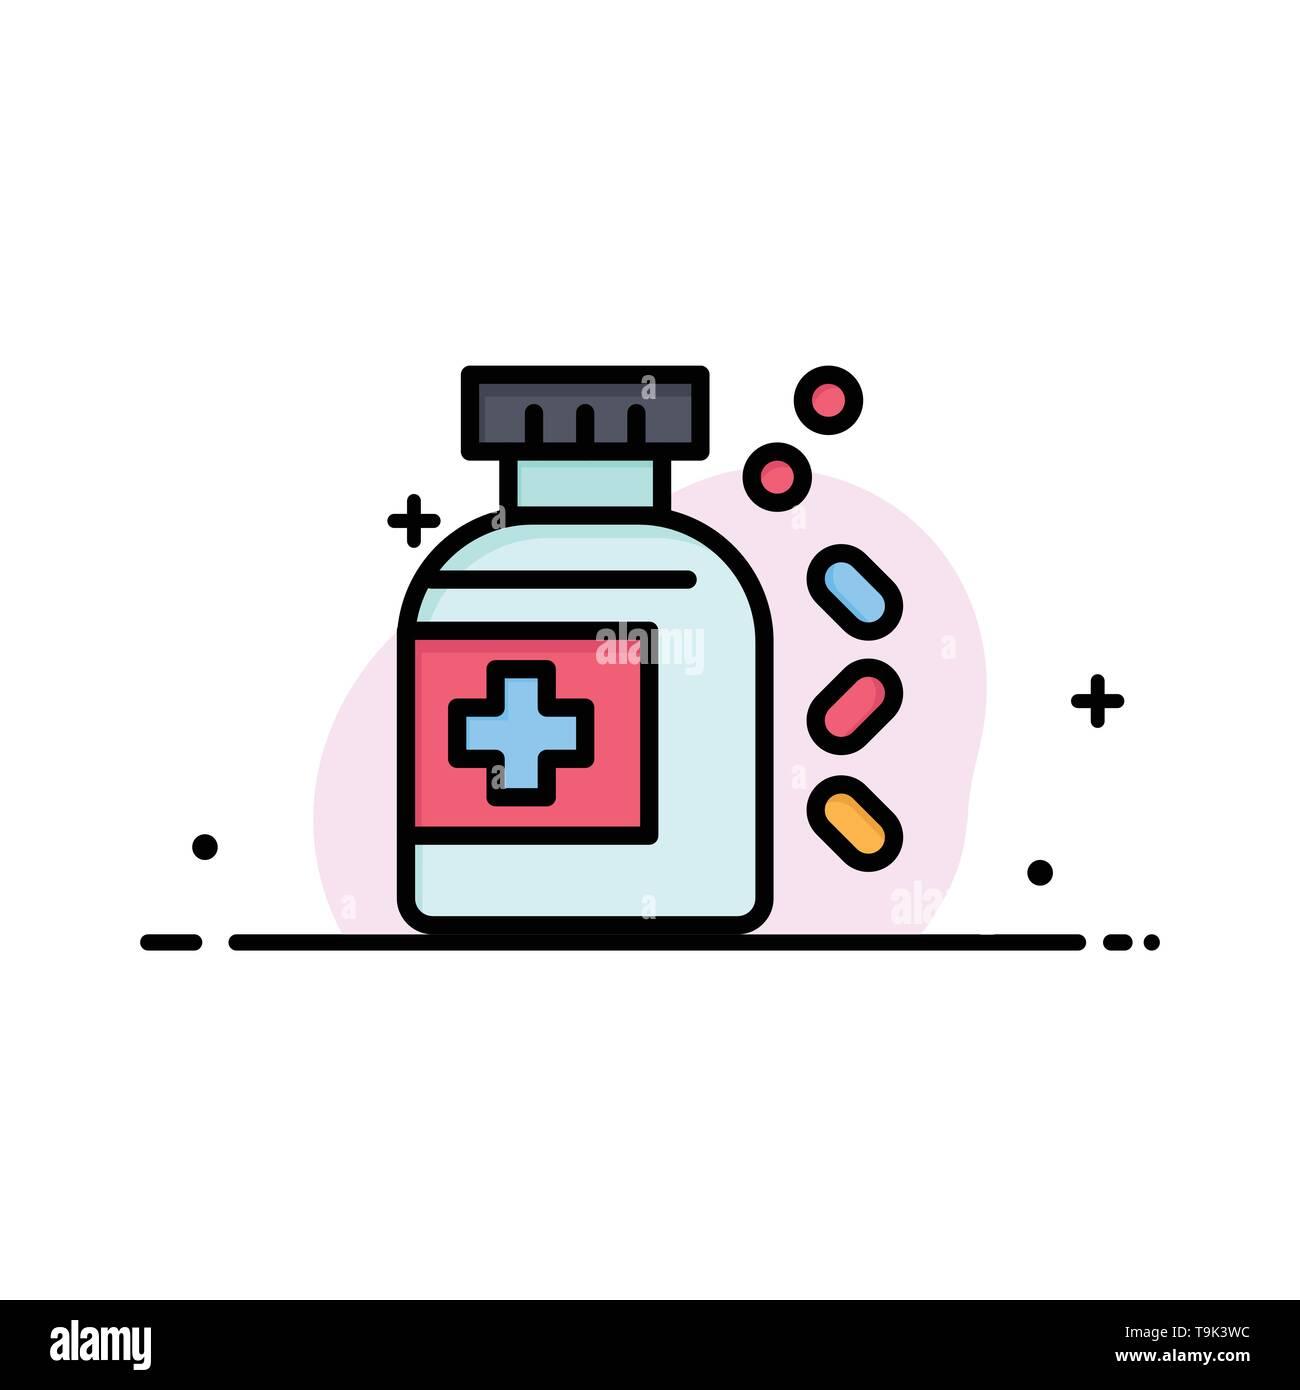 Bottle, Medicine, Tablet  Business Flat Line Filled Icon Vector Banner Template - Stock Image